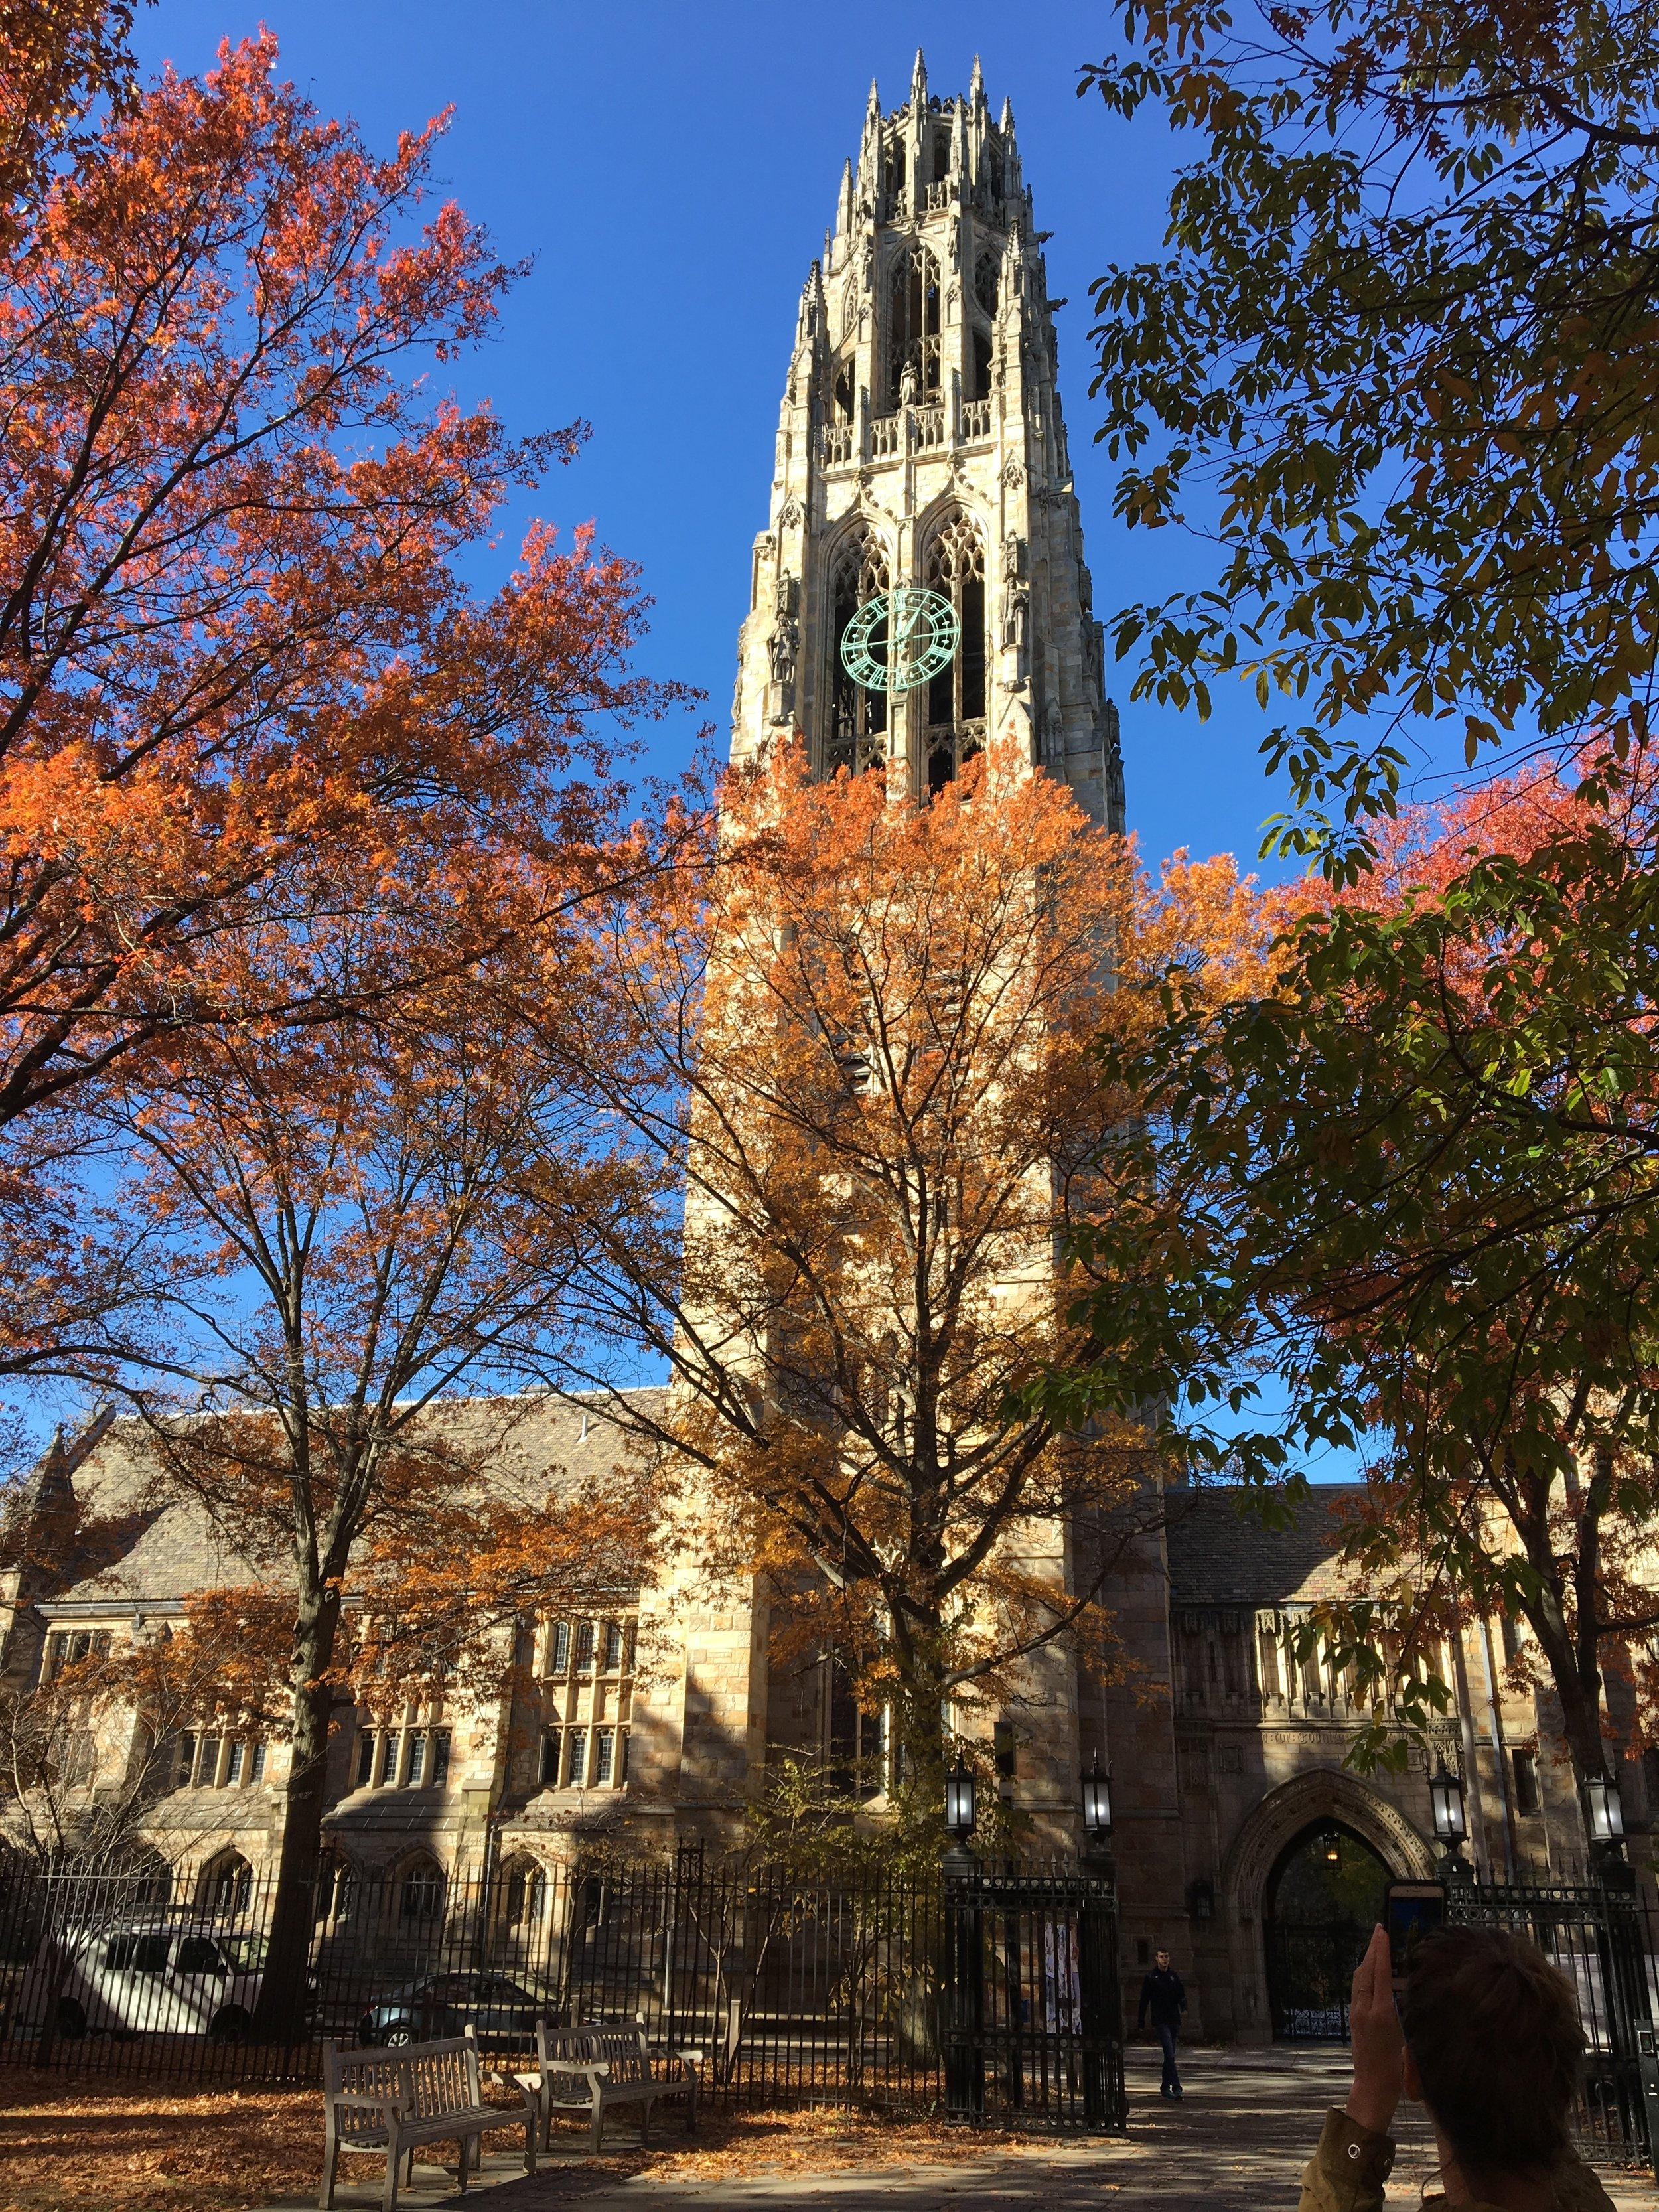 Harkness Tower, Yale University